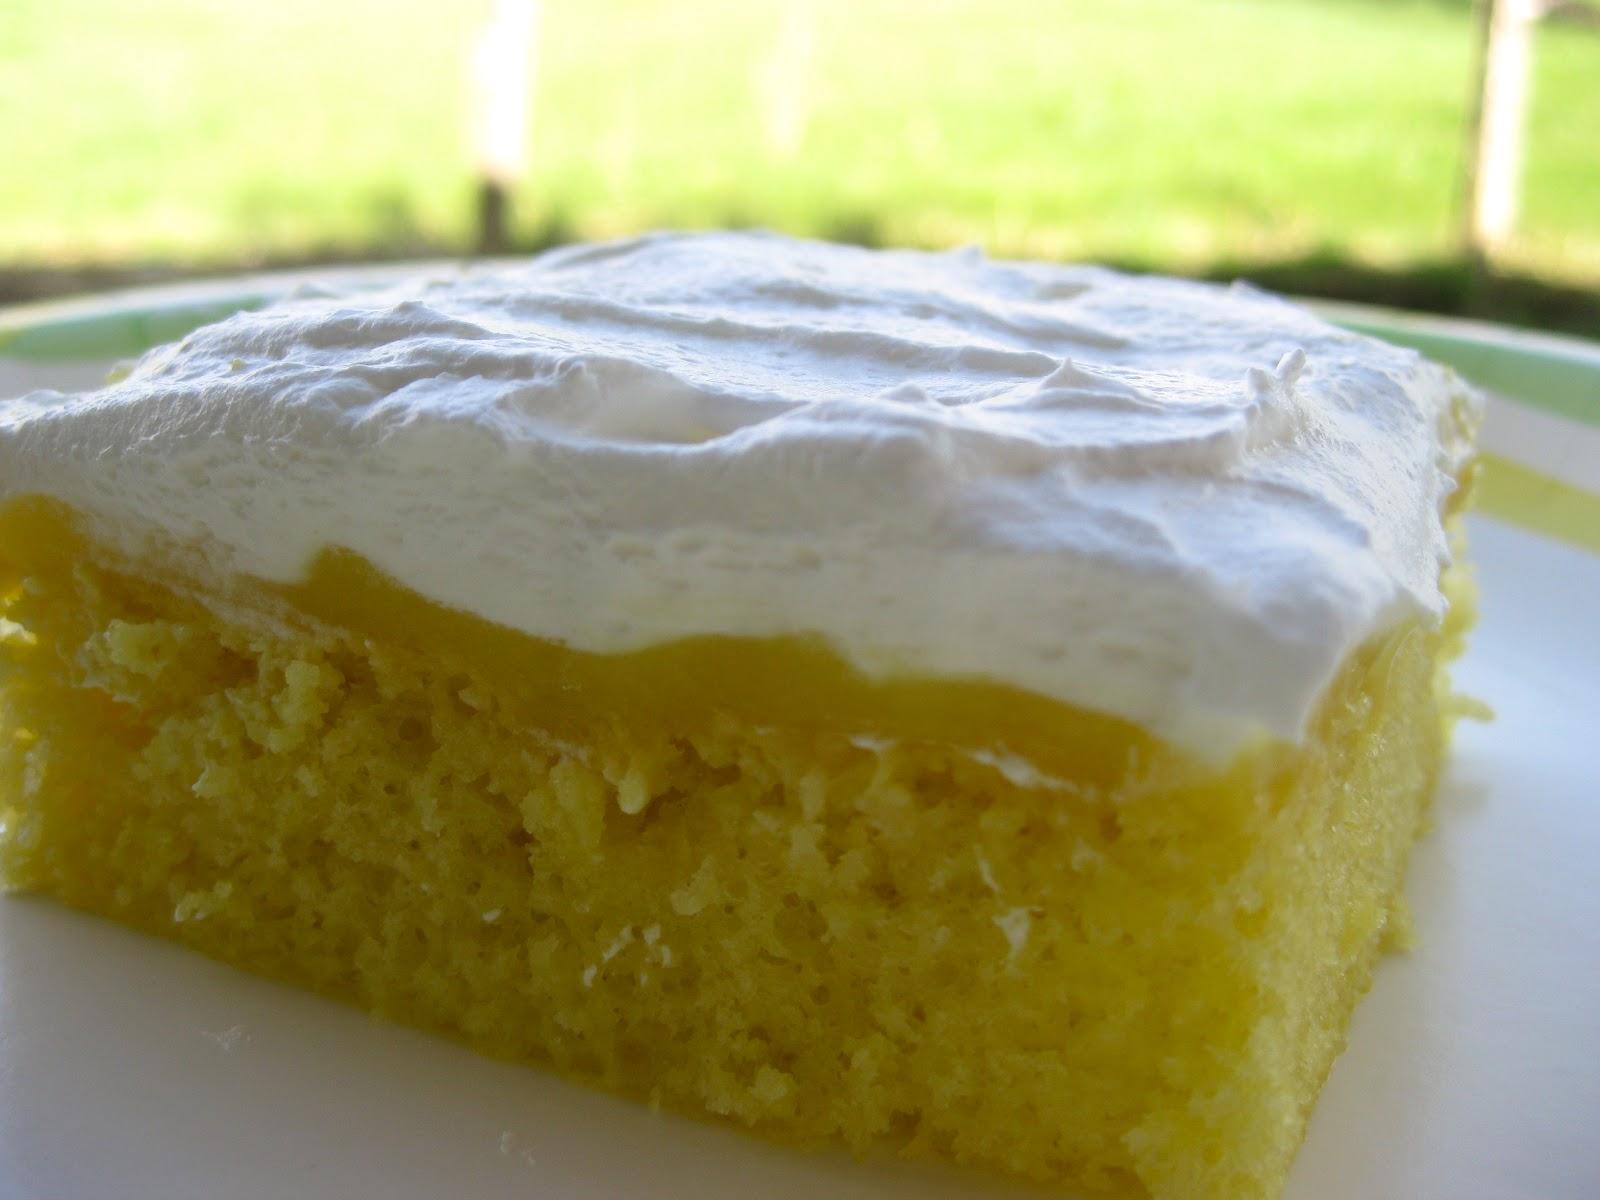 Time For Supper!: Lemon Pudding Cake